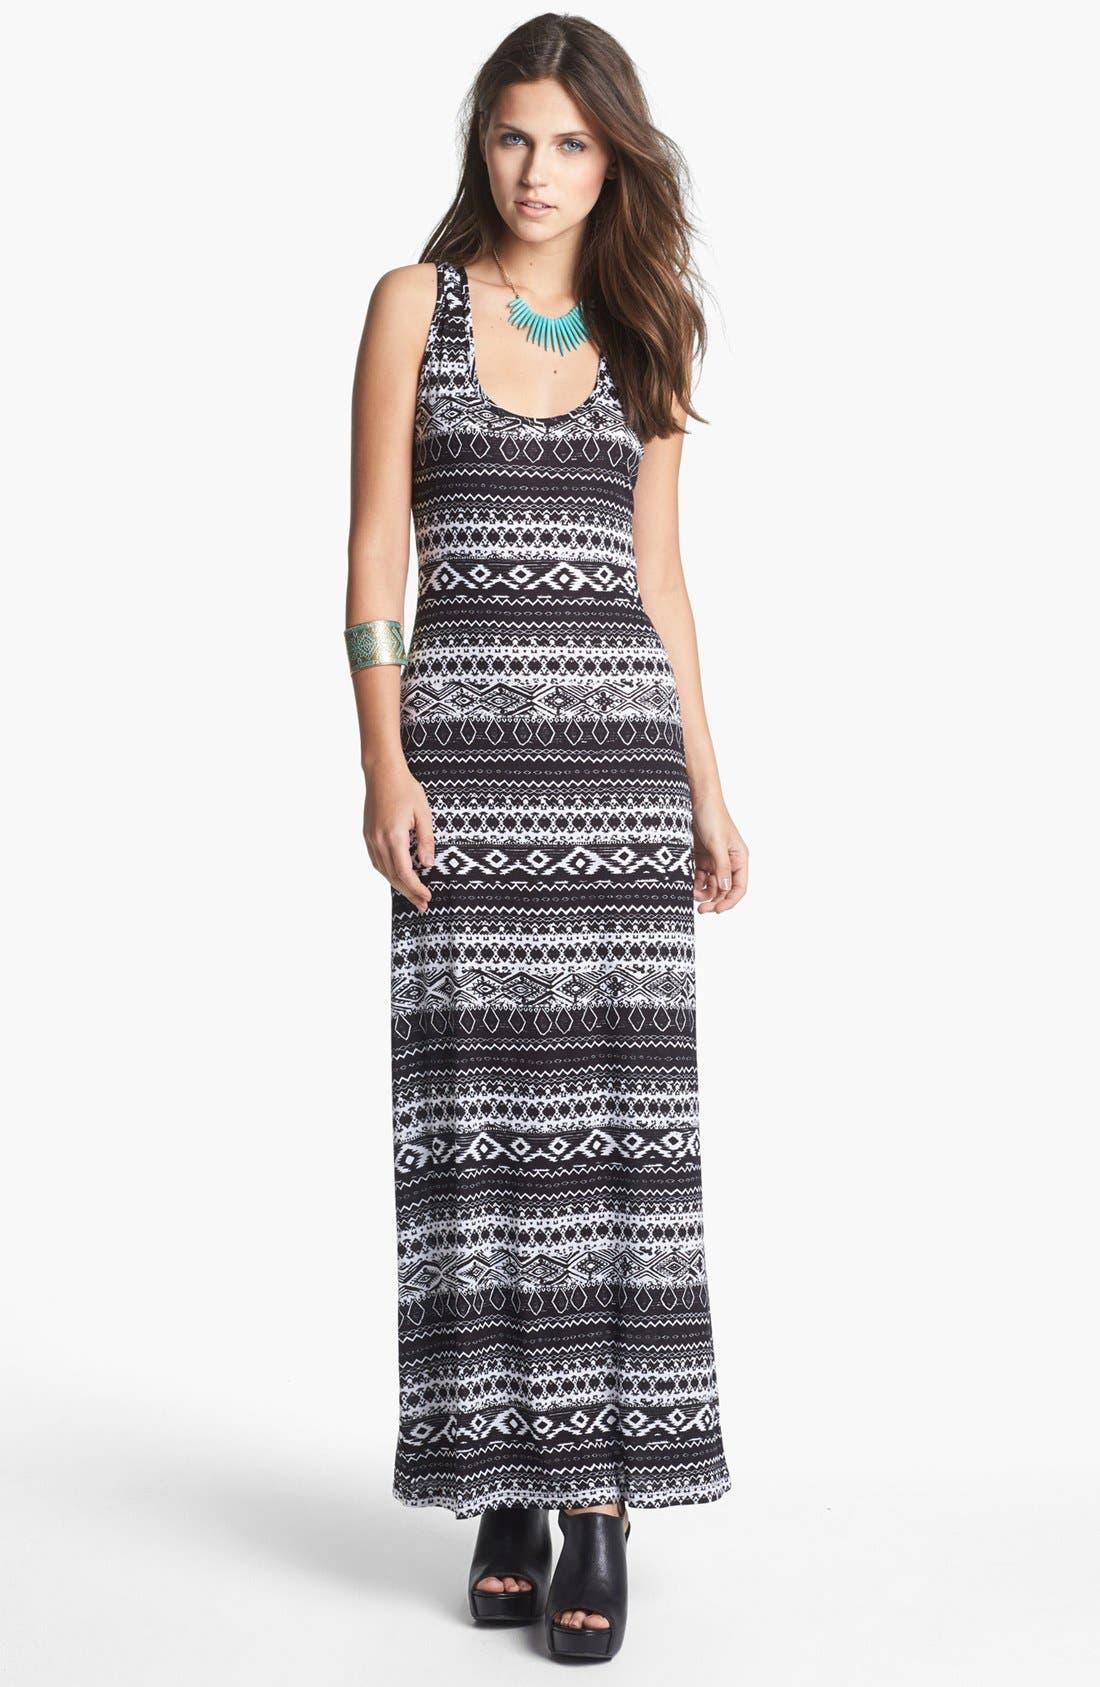 MINTY Racerback Maxi Dress, Main, color, 001